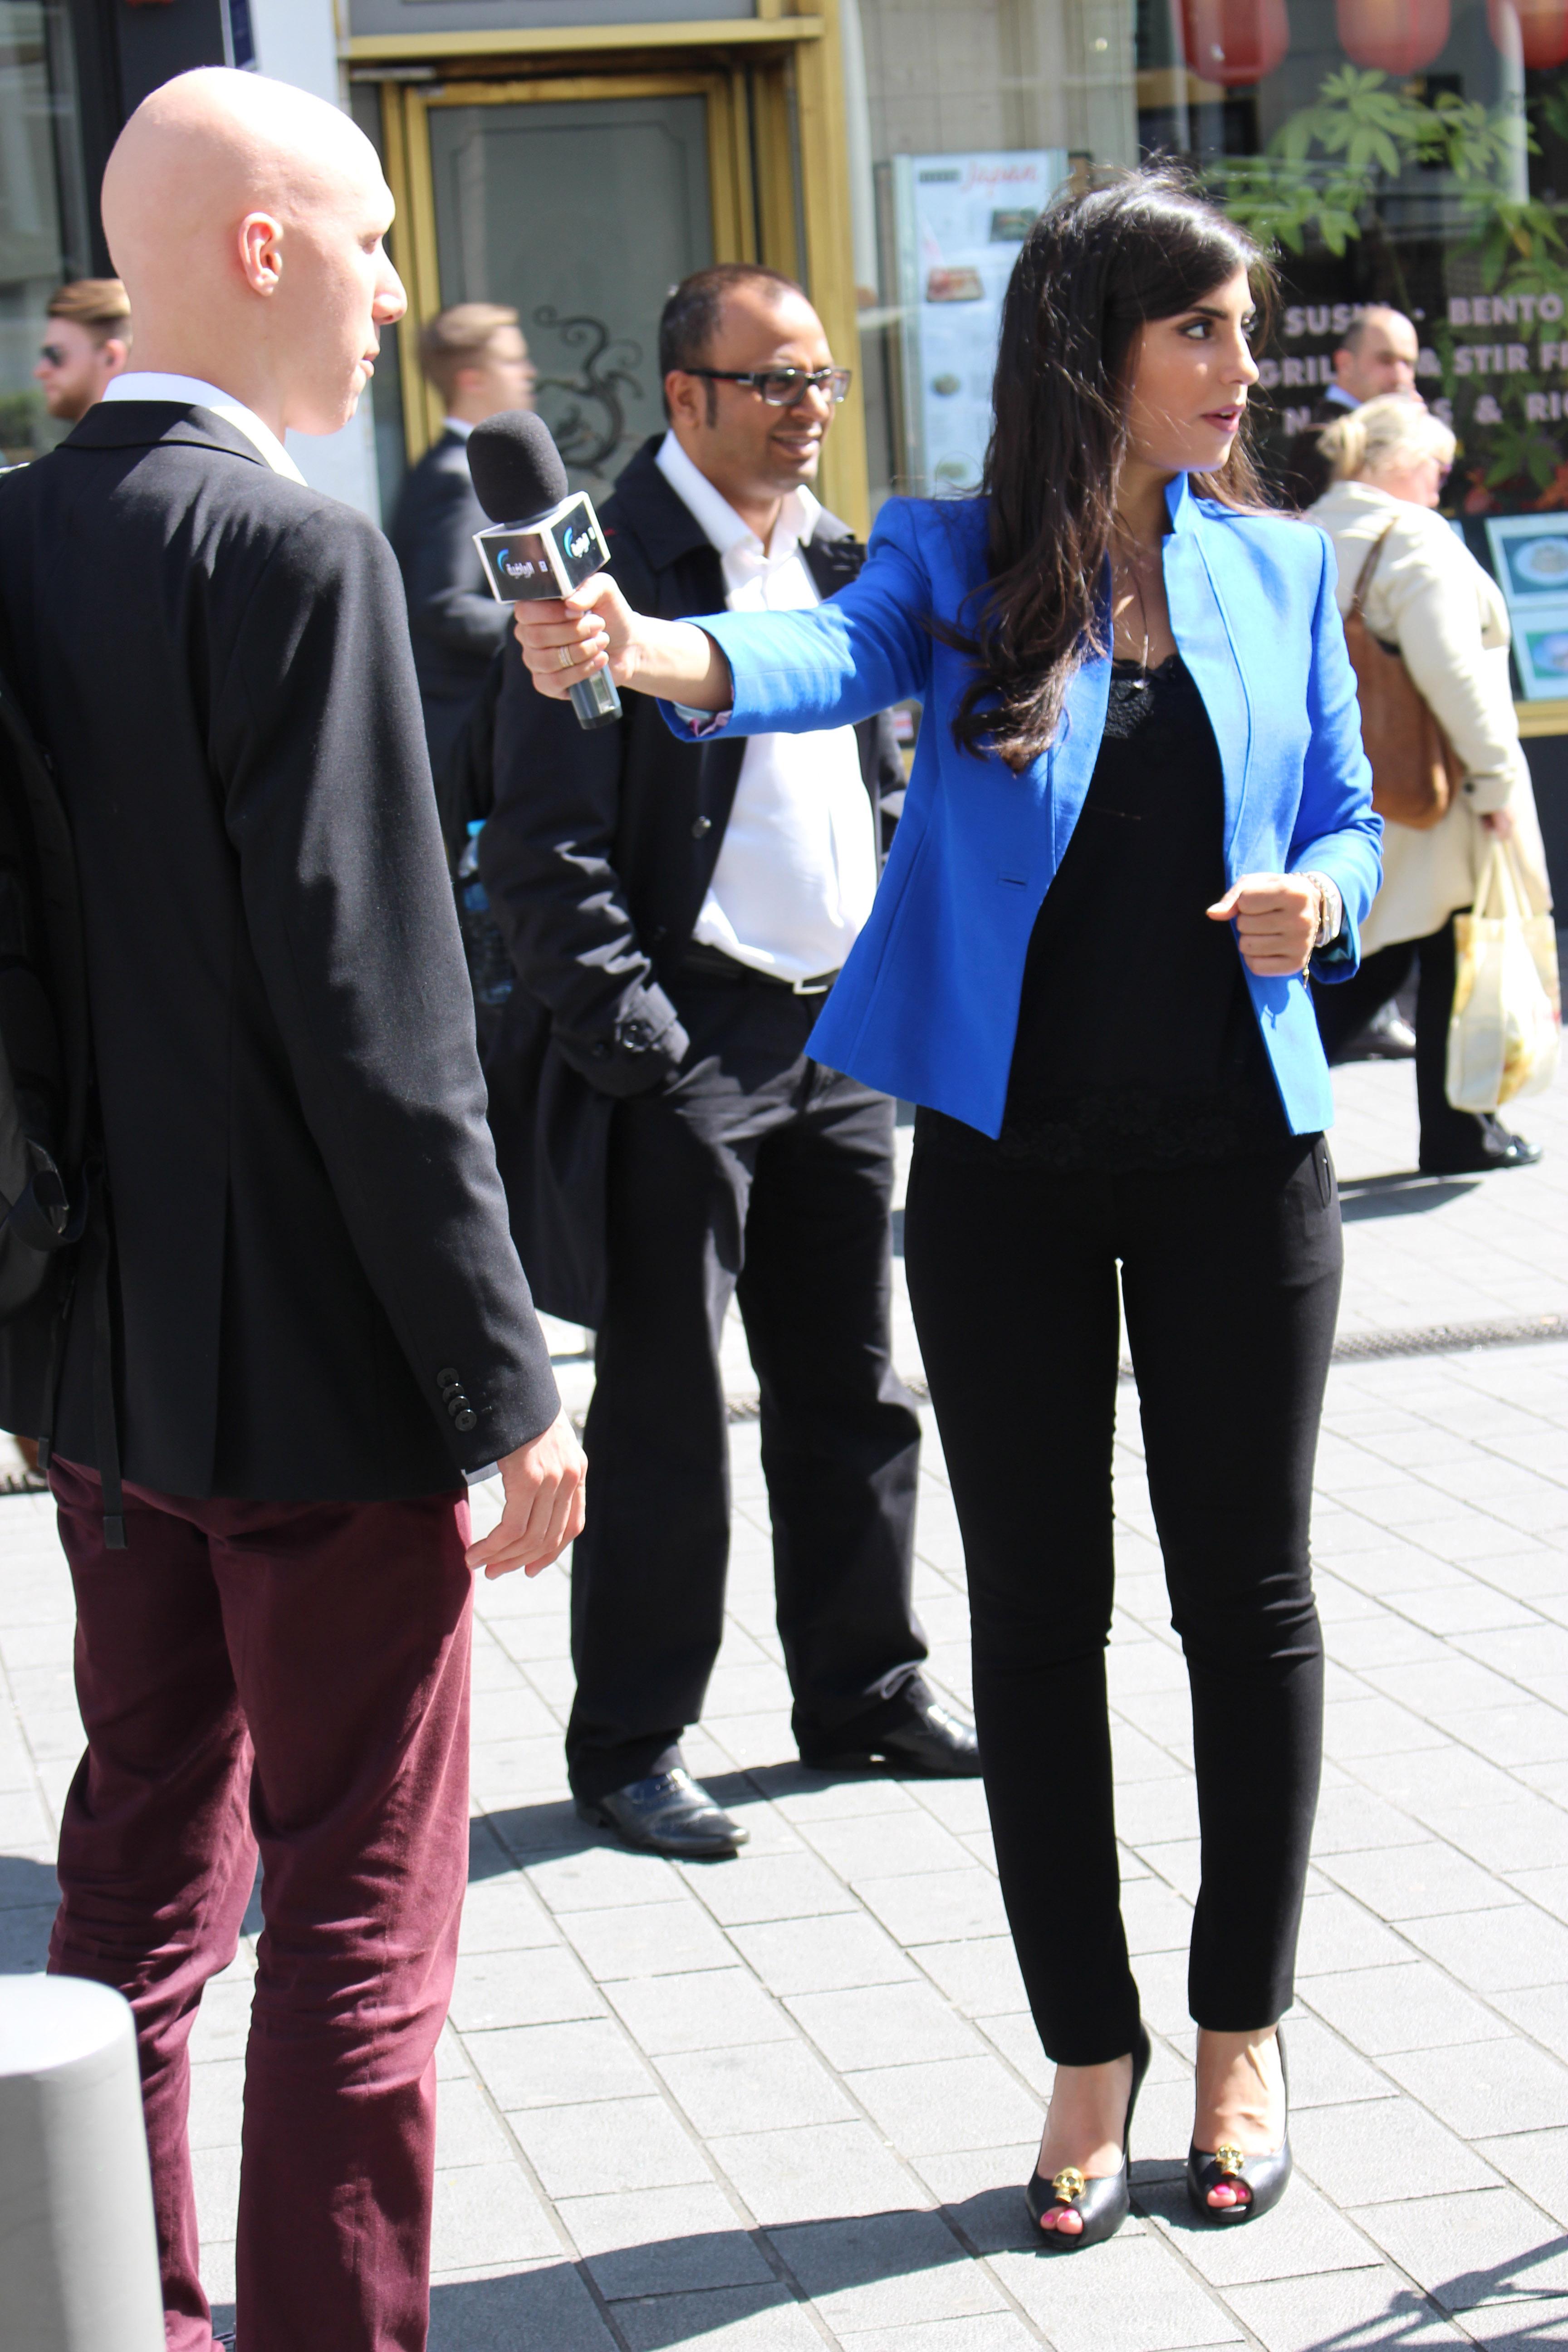 reporter in blue